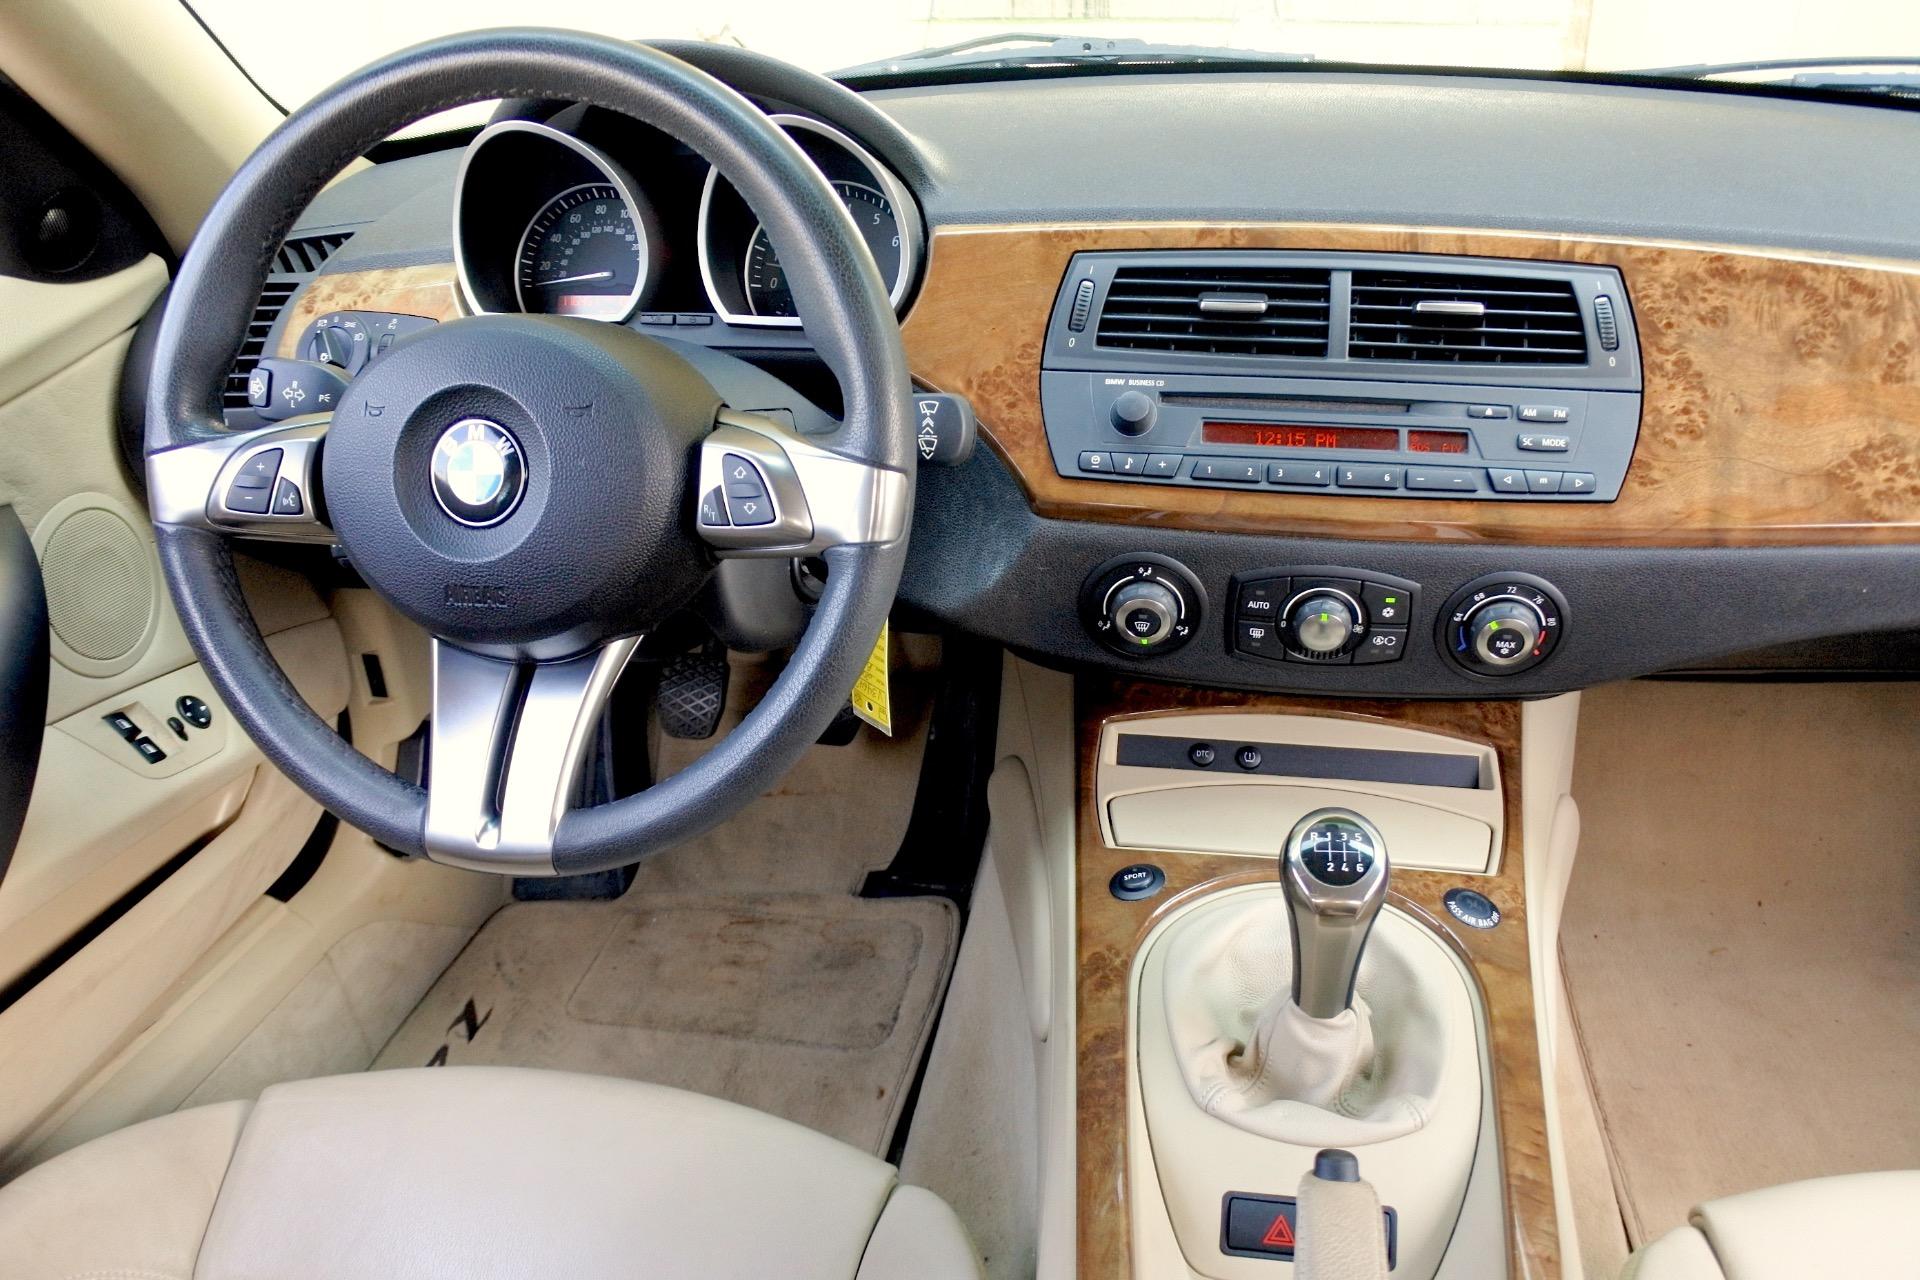 Used 2007 BMW Z4 2dr Coupe 3.0si Used 2007 BMW Z4 2dr Coupe 3.0si for sale  at Metro West Motorcars LLC in Shrewsbury MA 10